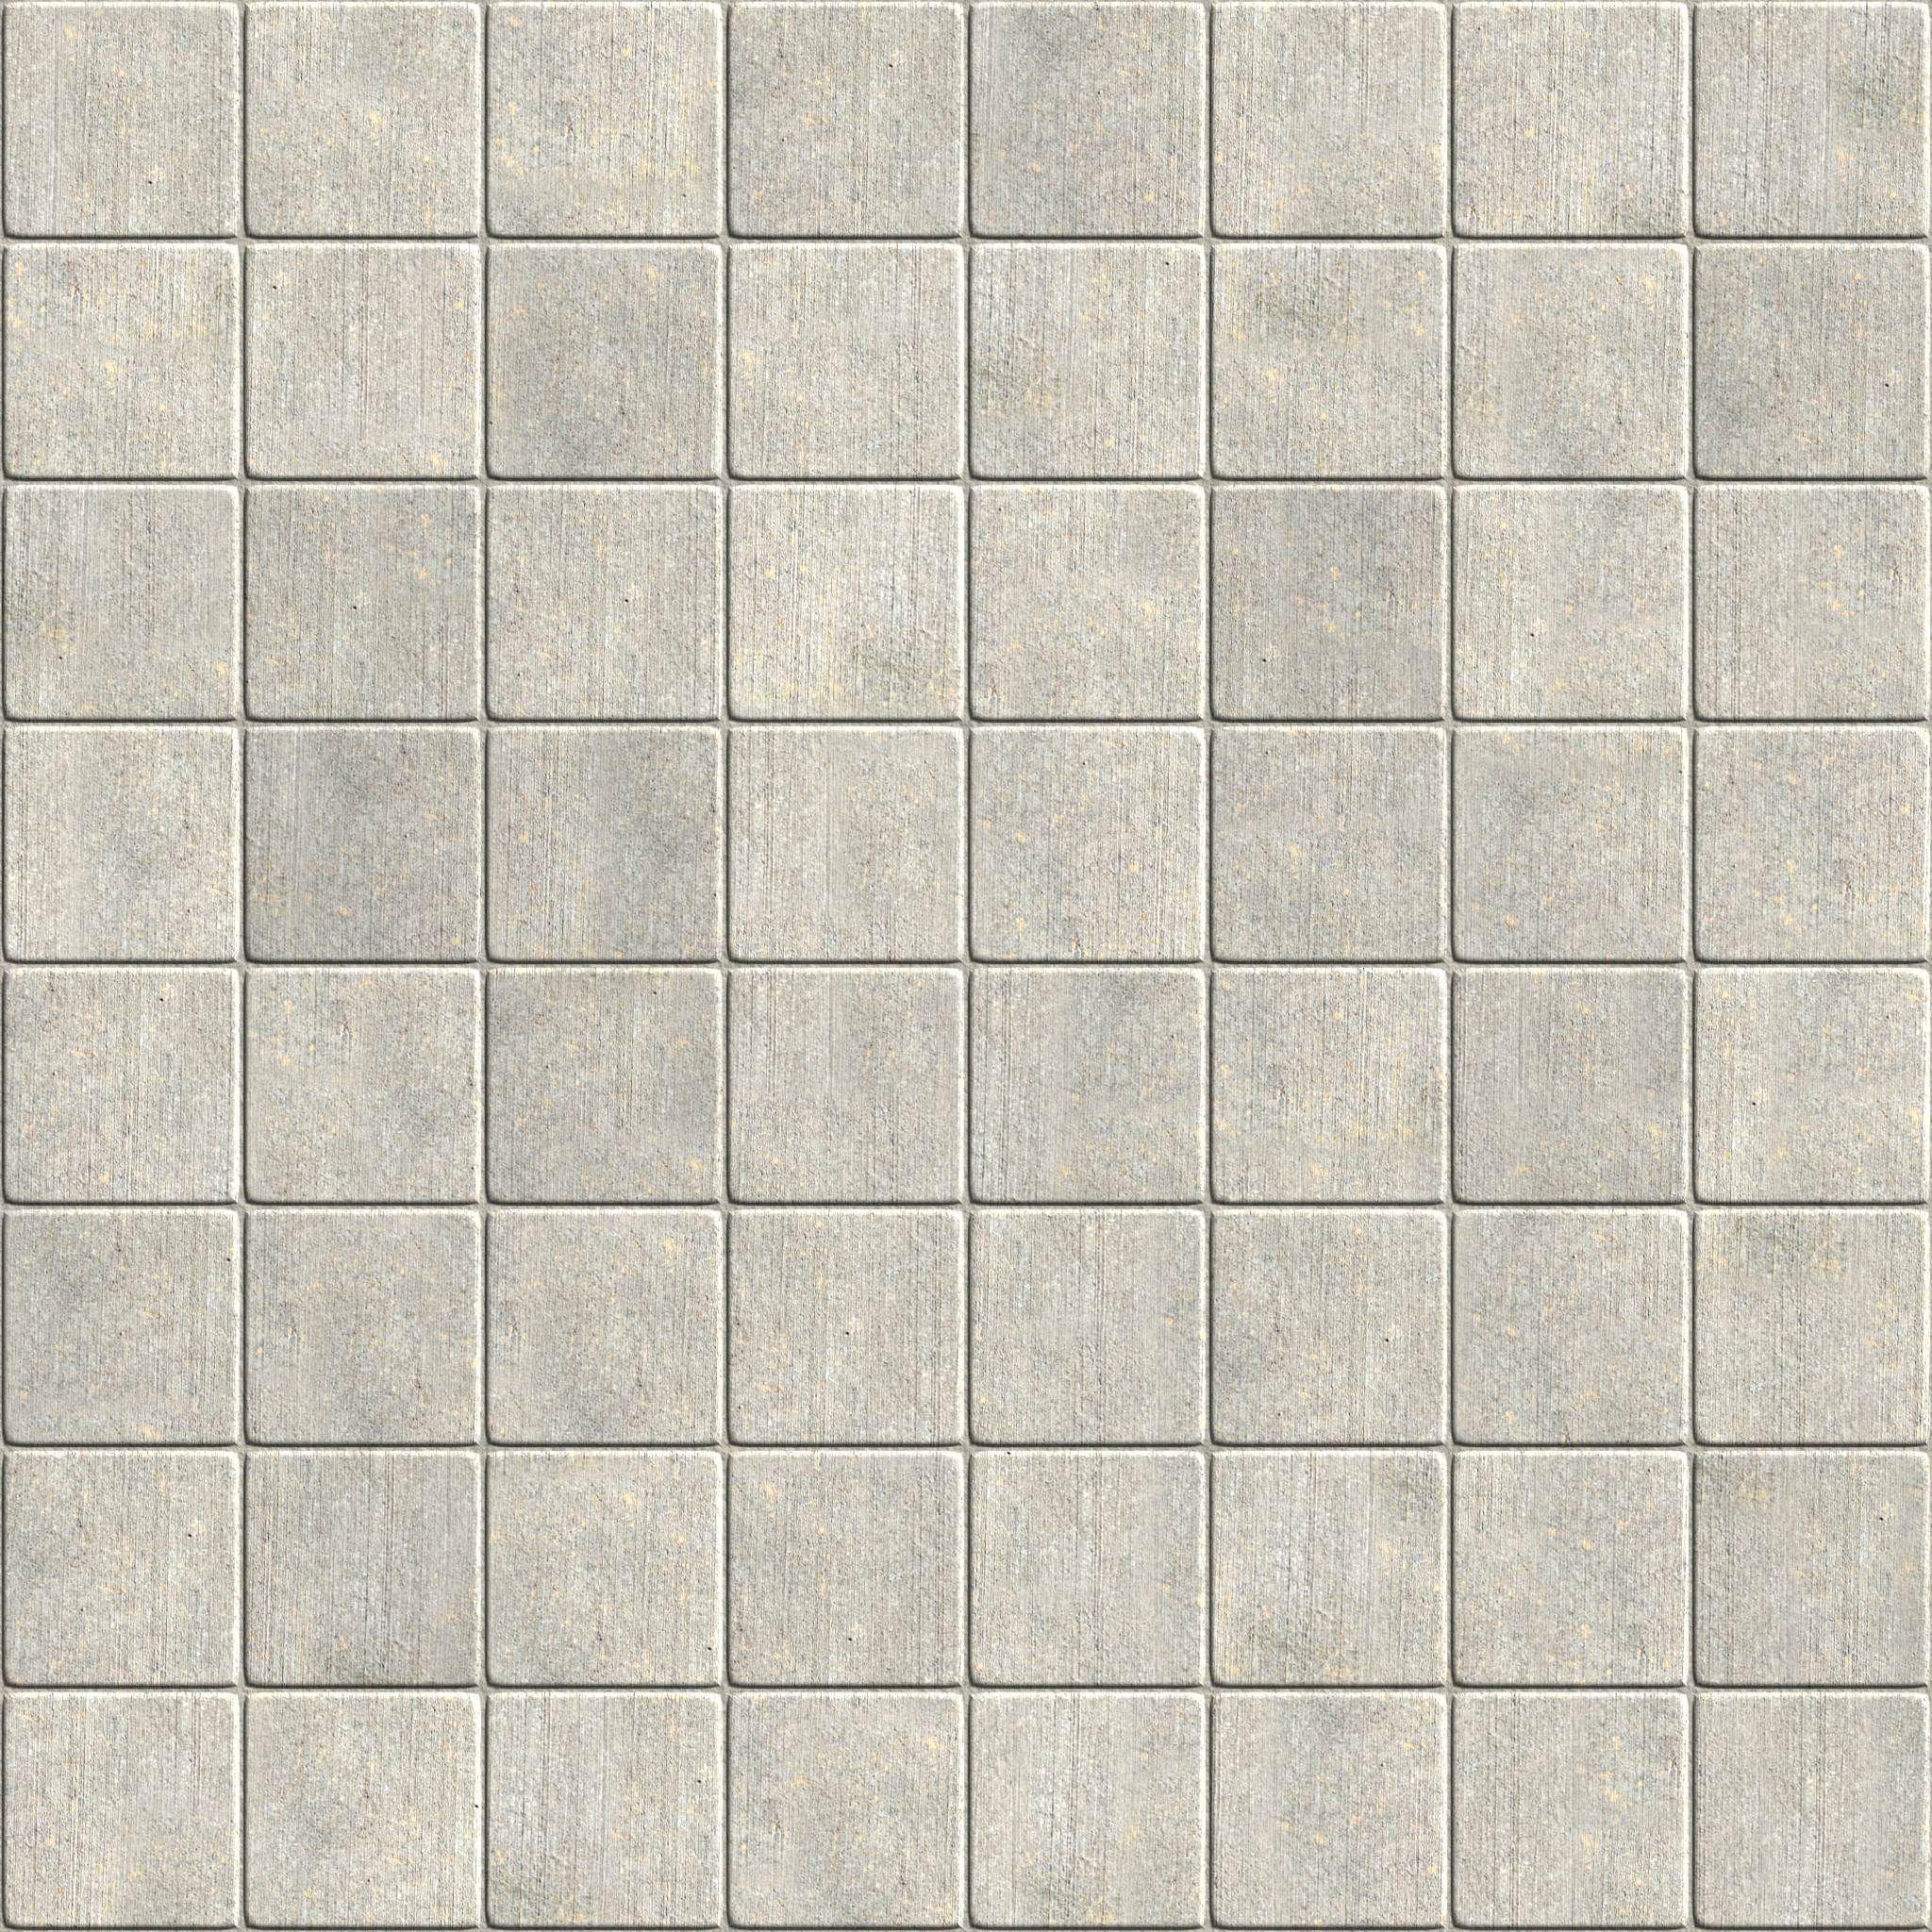 Bon Category Archives: Bathroom Floor Tile